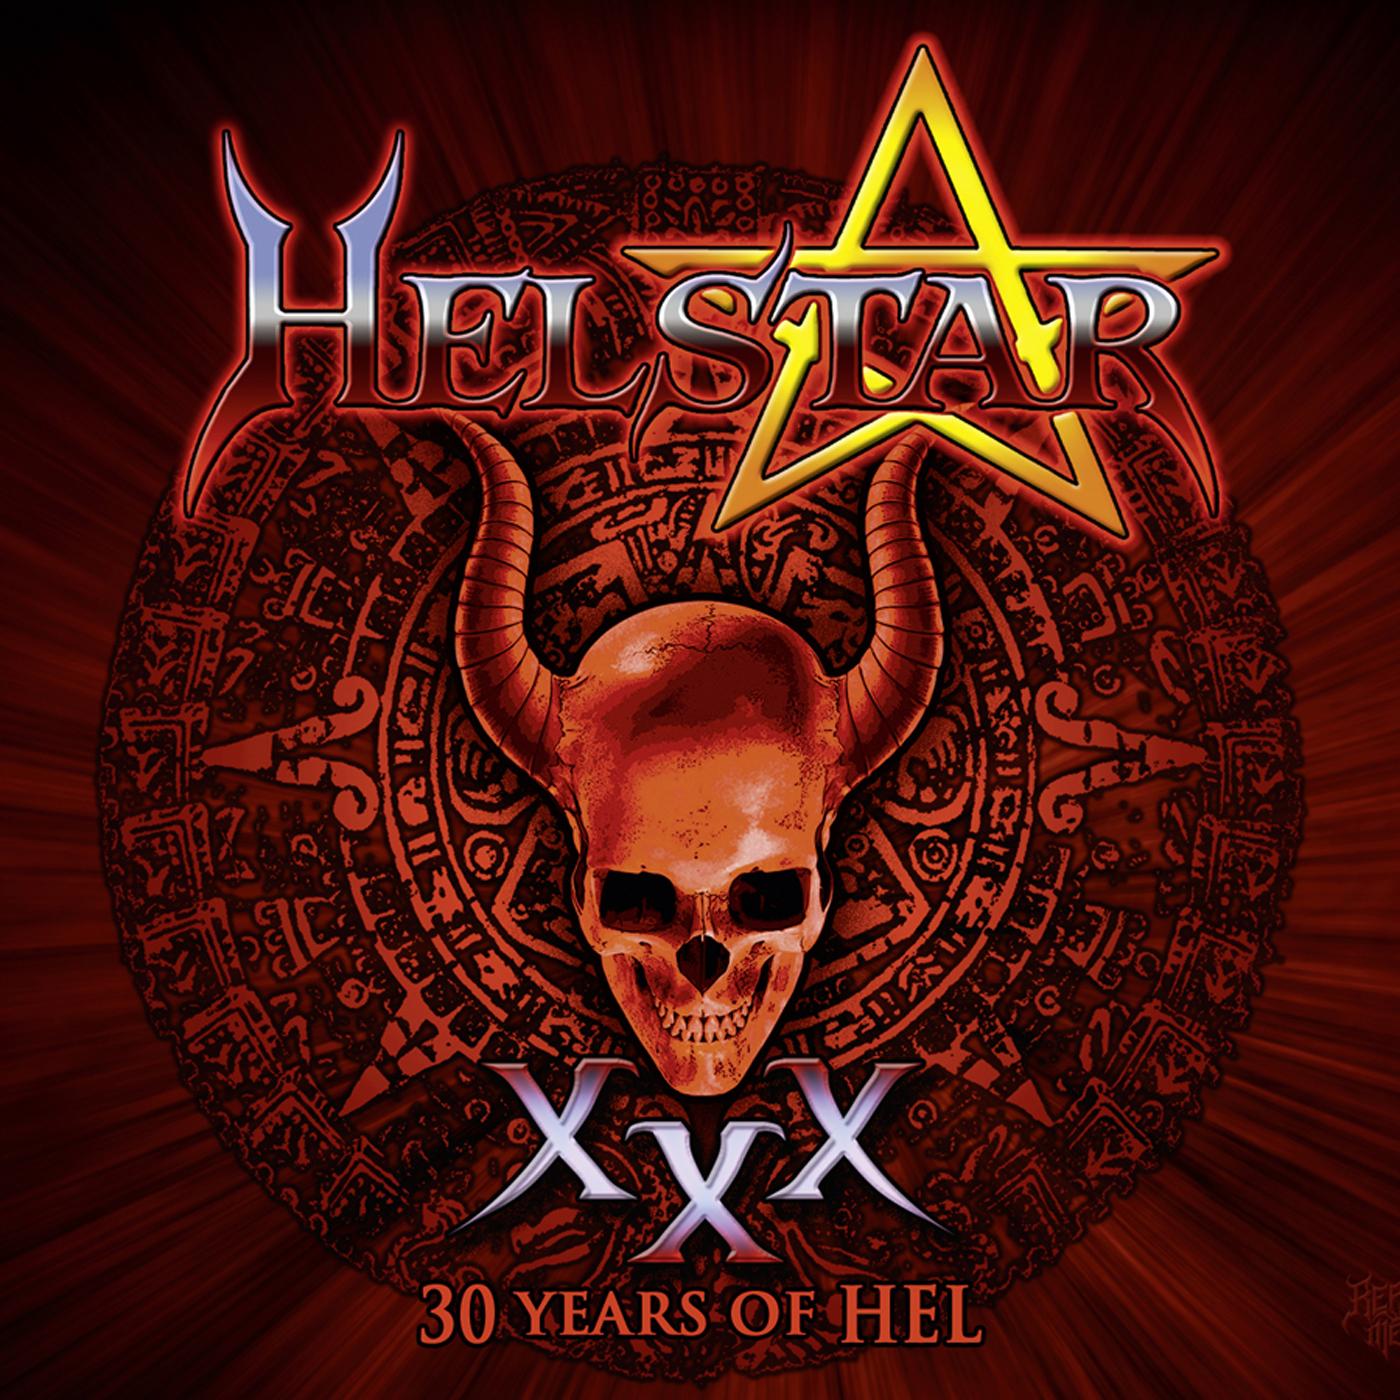 Helstar: XXX - 30 Years of Hel